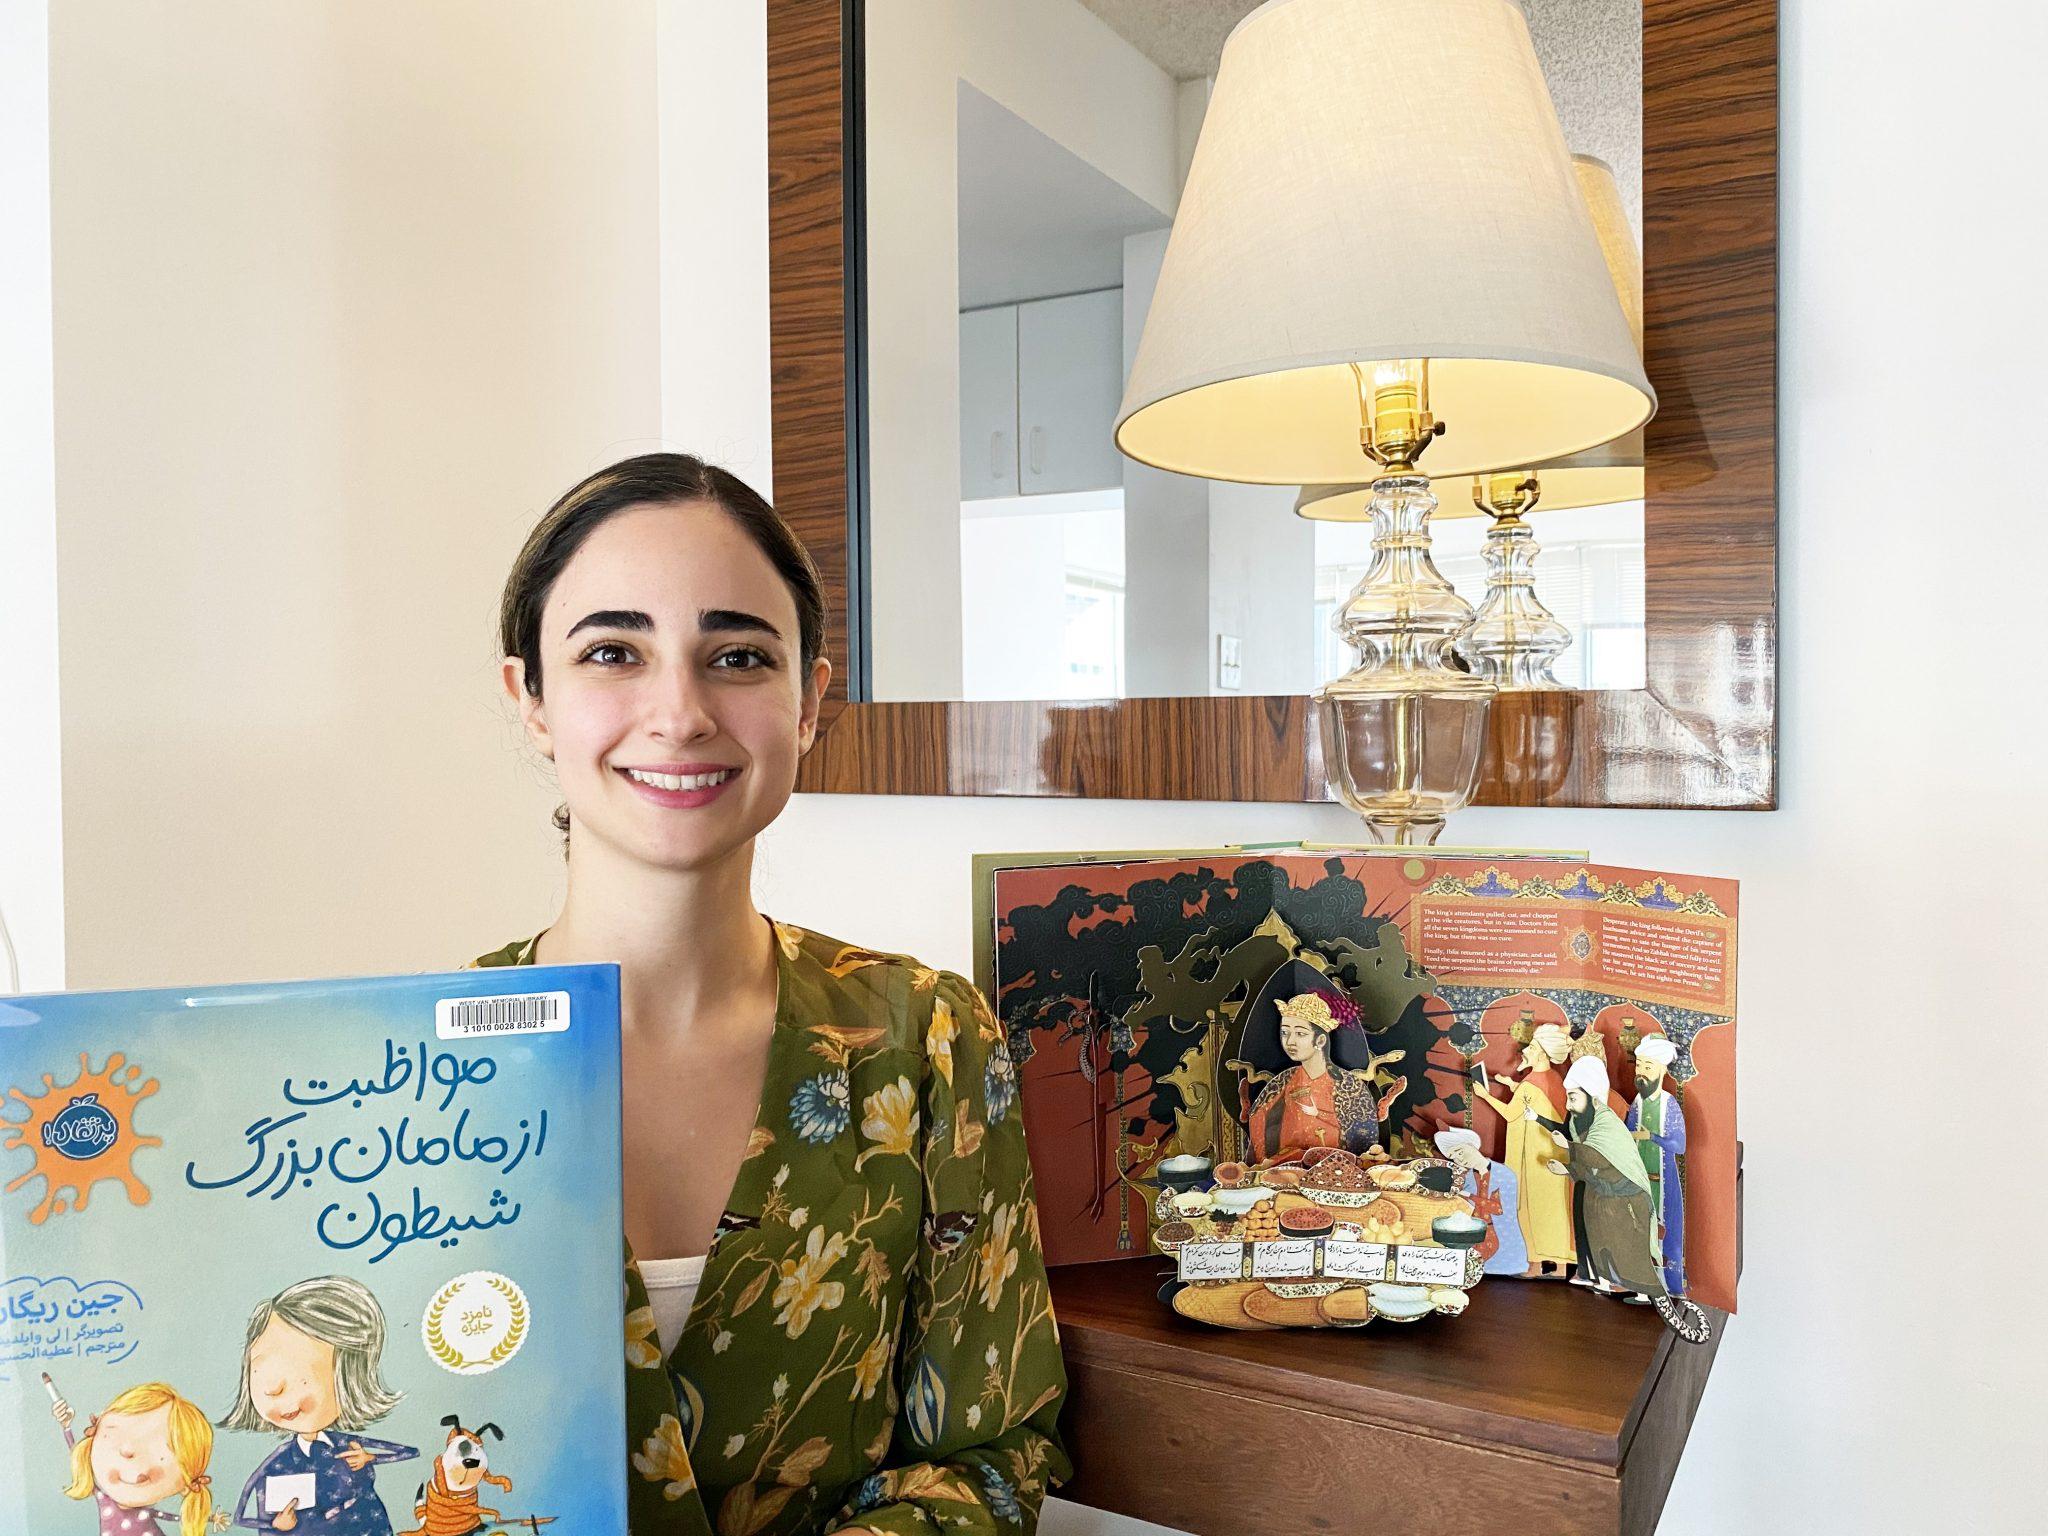 Sanam poses with two picture books in Farsi